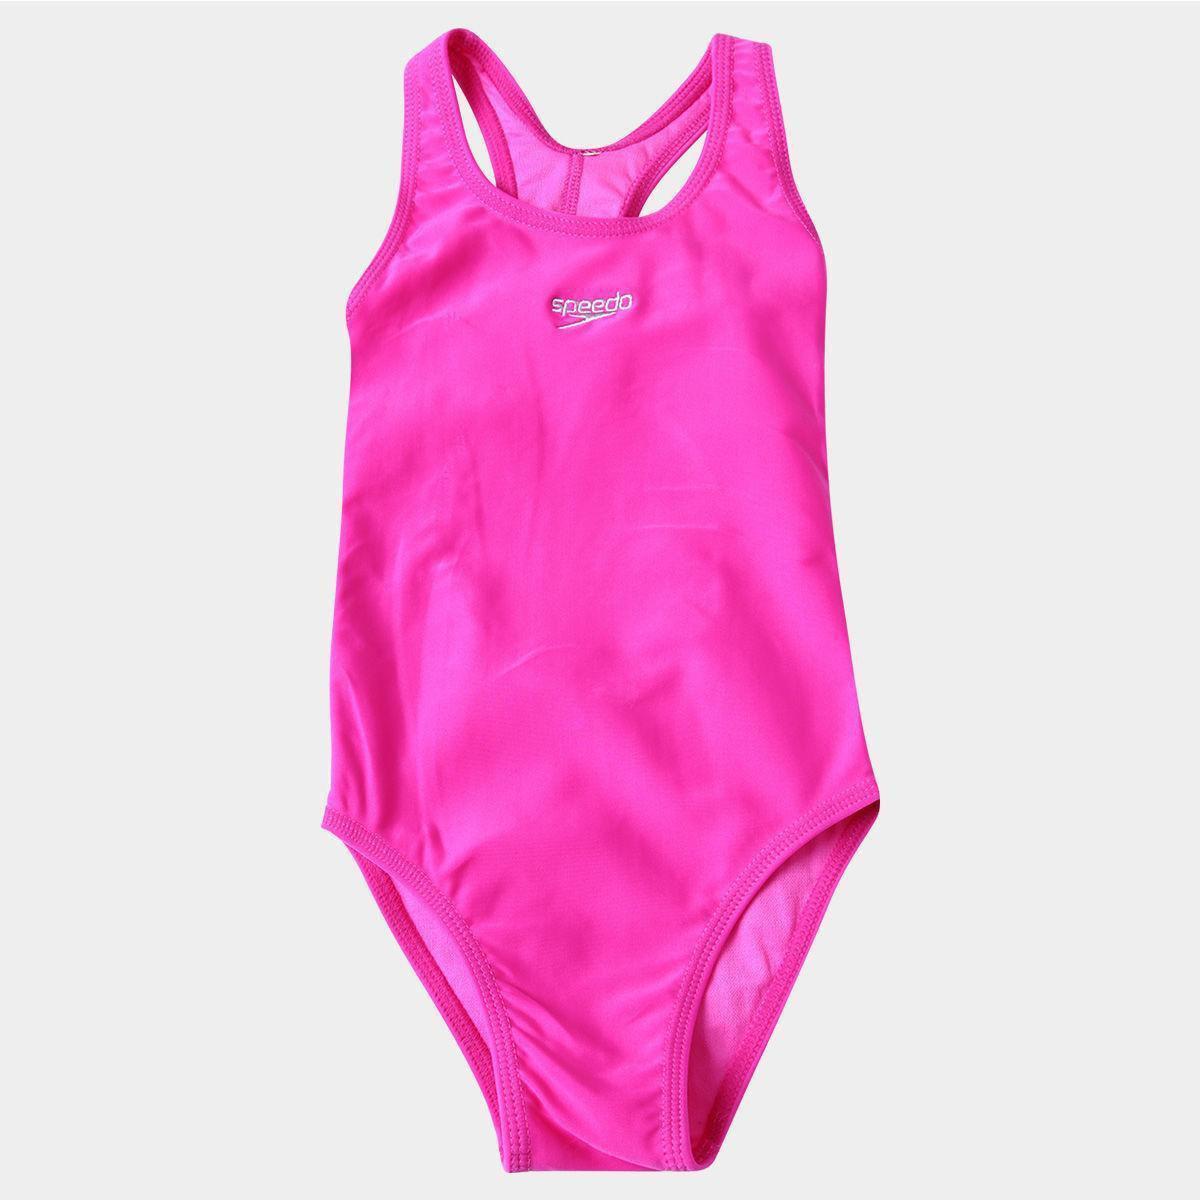 Vital 3 Speedo Maiô Pink Speedo Vital Pink 3 Juvenil Juvenil Maiô Speedo Maiô Vital Awqv1